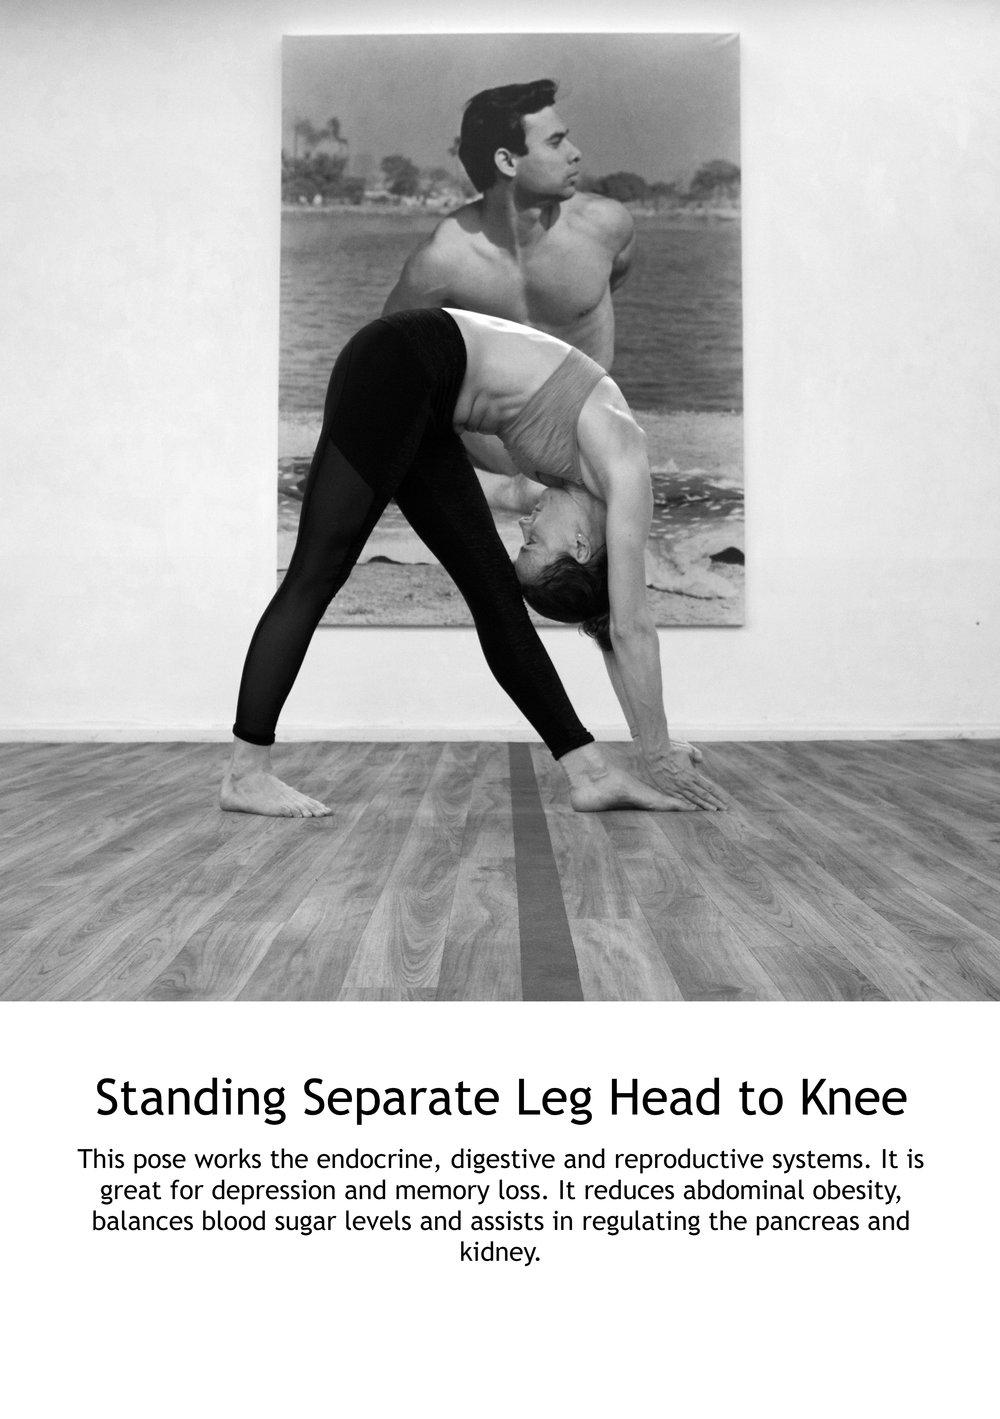 Standing Separate Leg Head to Knee